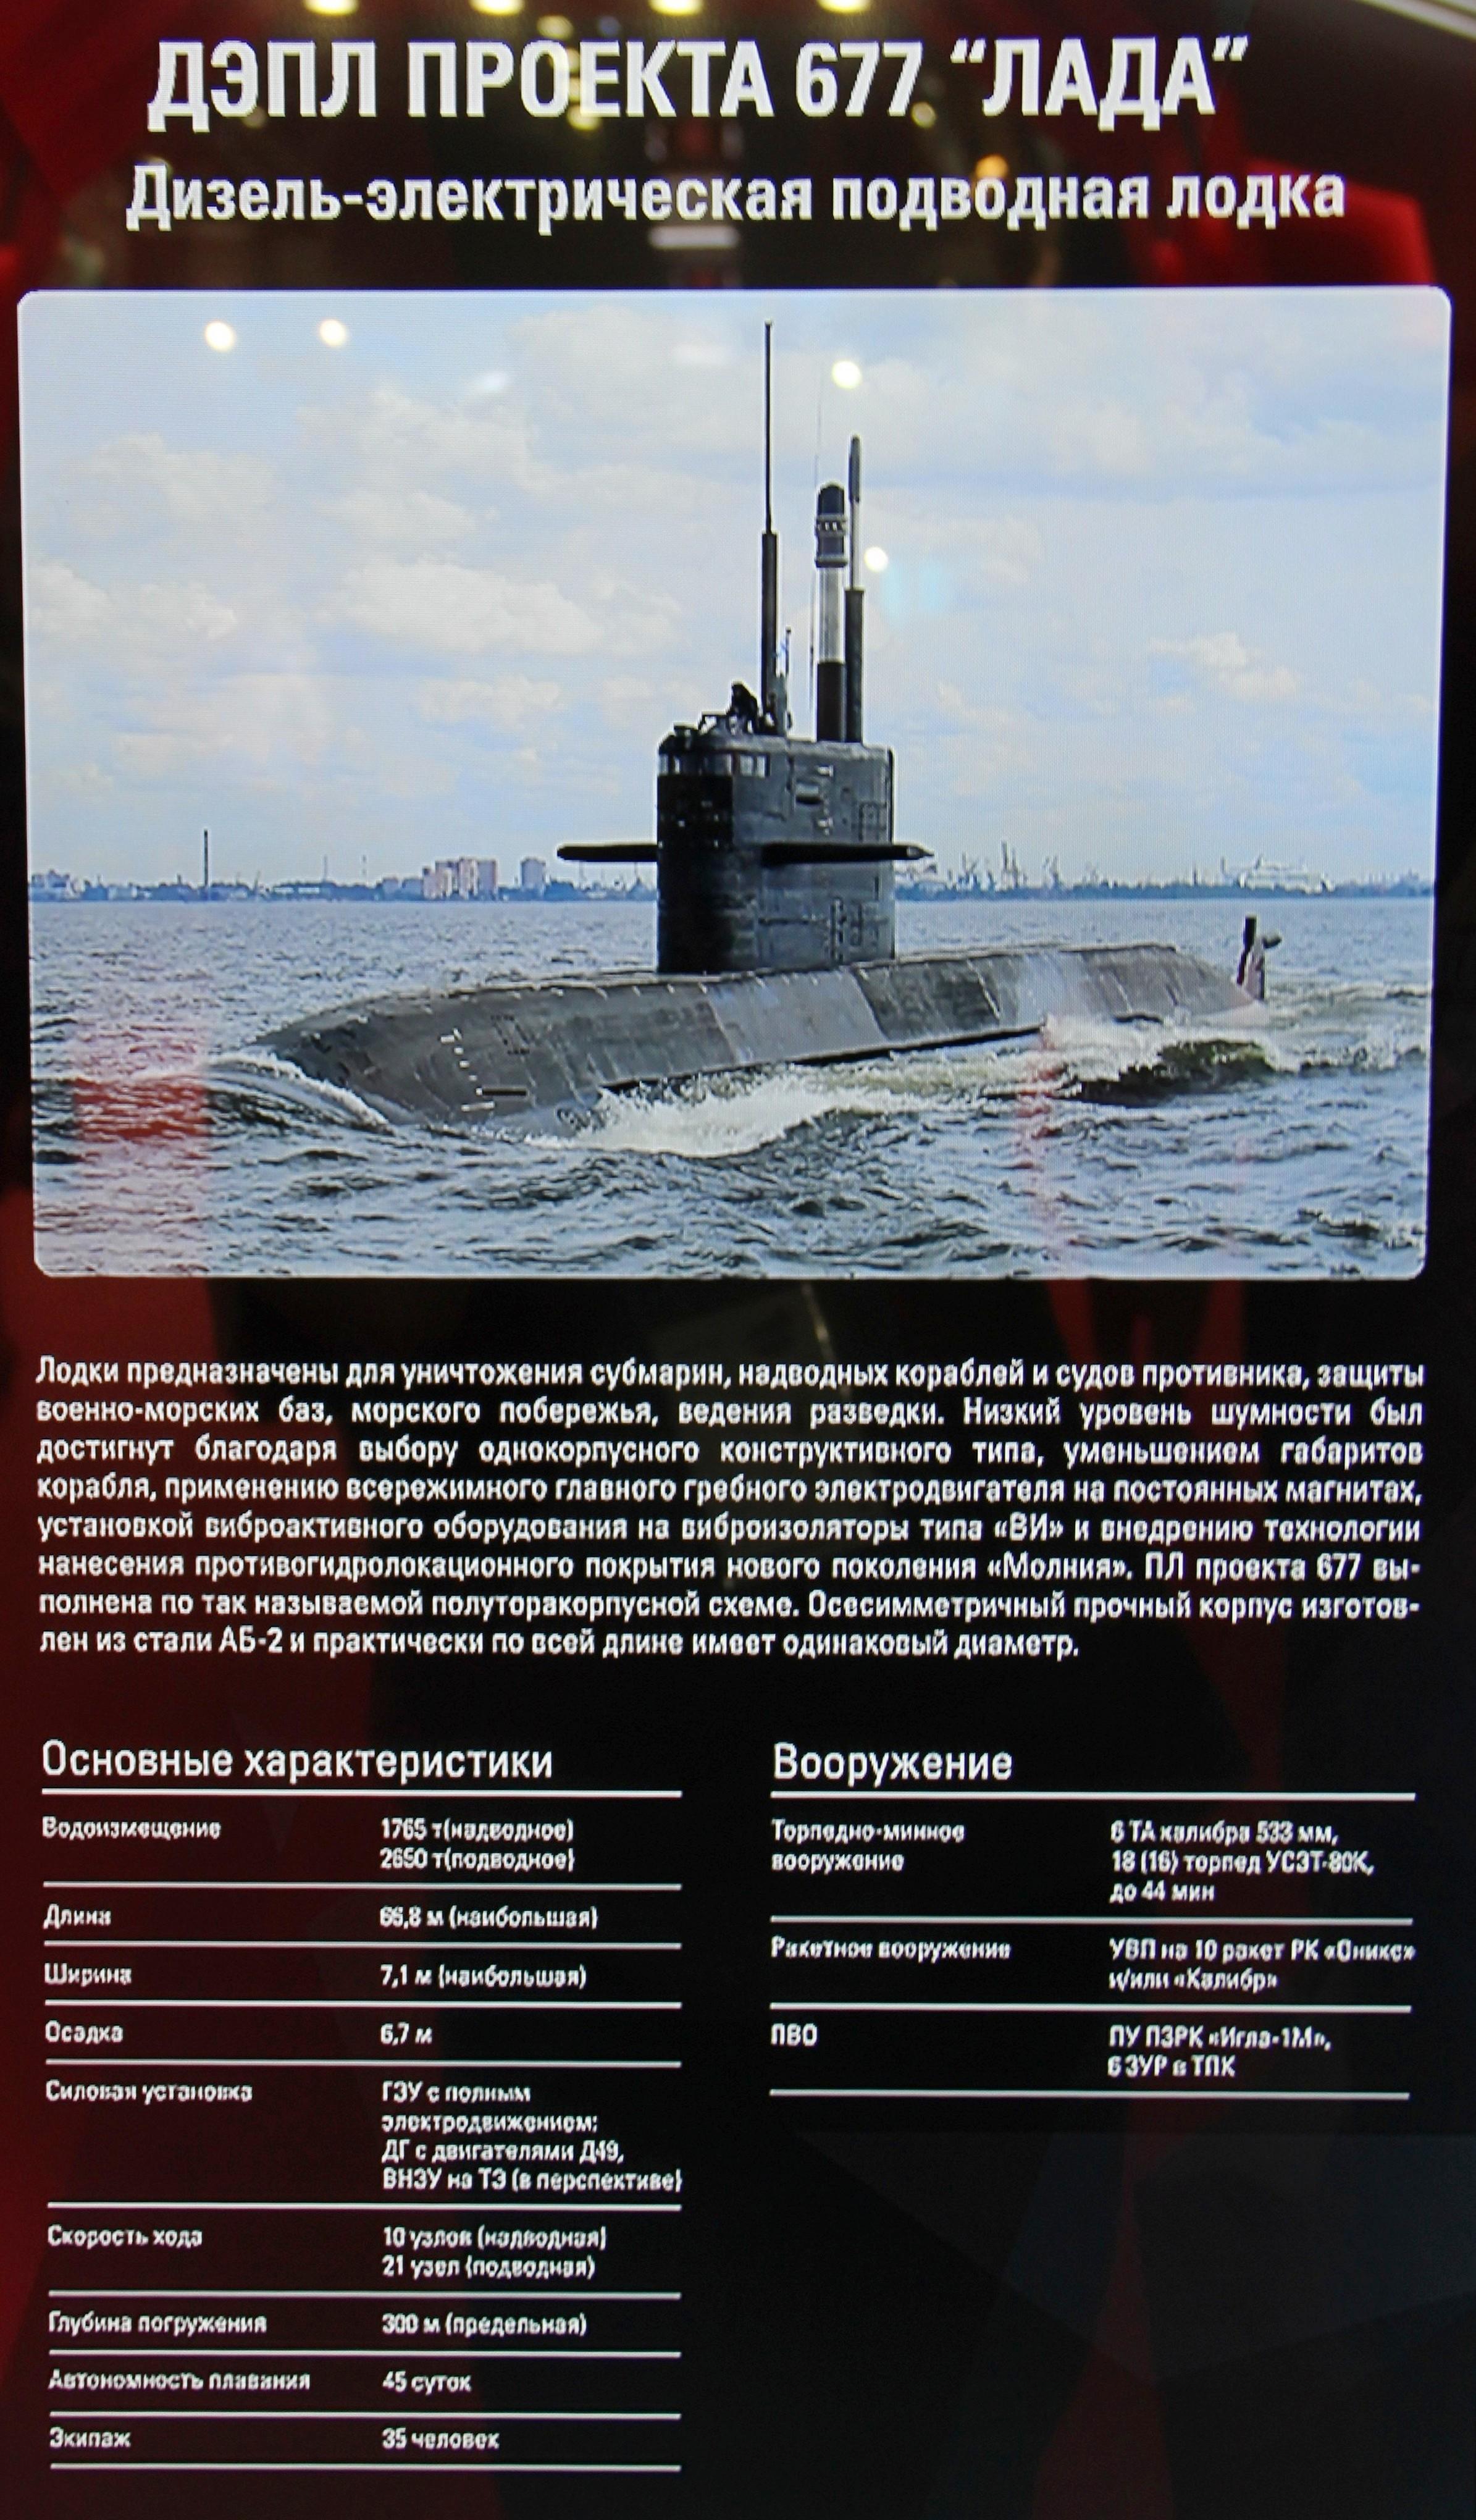 Project 677: Lada/Amur(export) class Submarine - Page 18 25-7724029-677-lada-osnovnye-kharakteristiki-armiya-2019